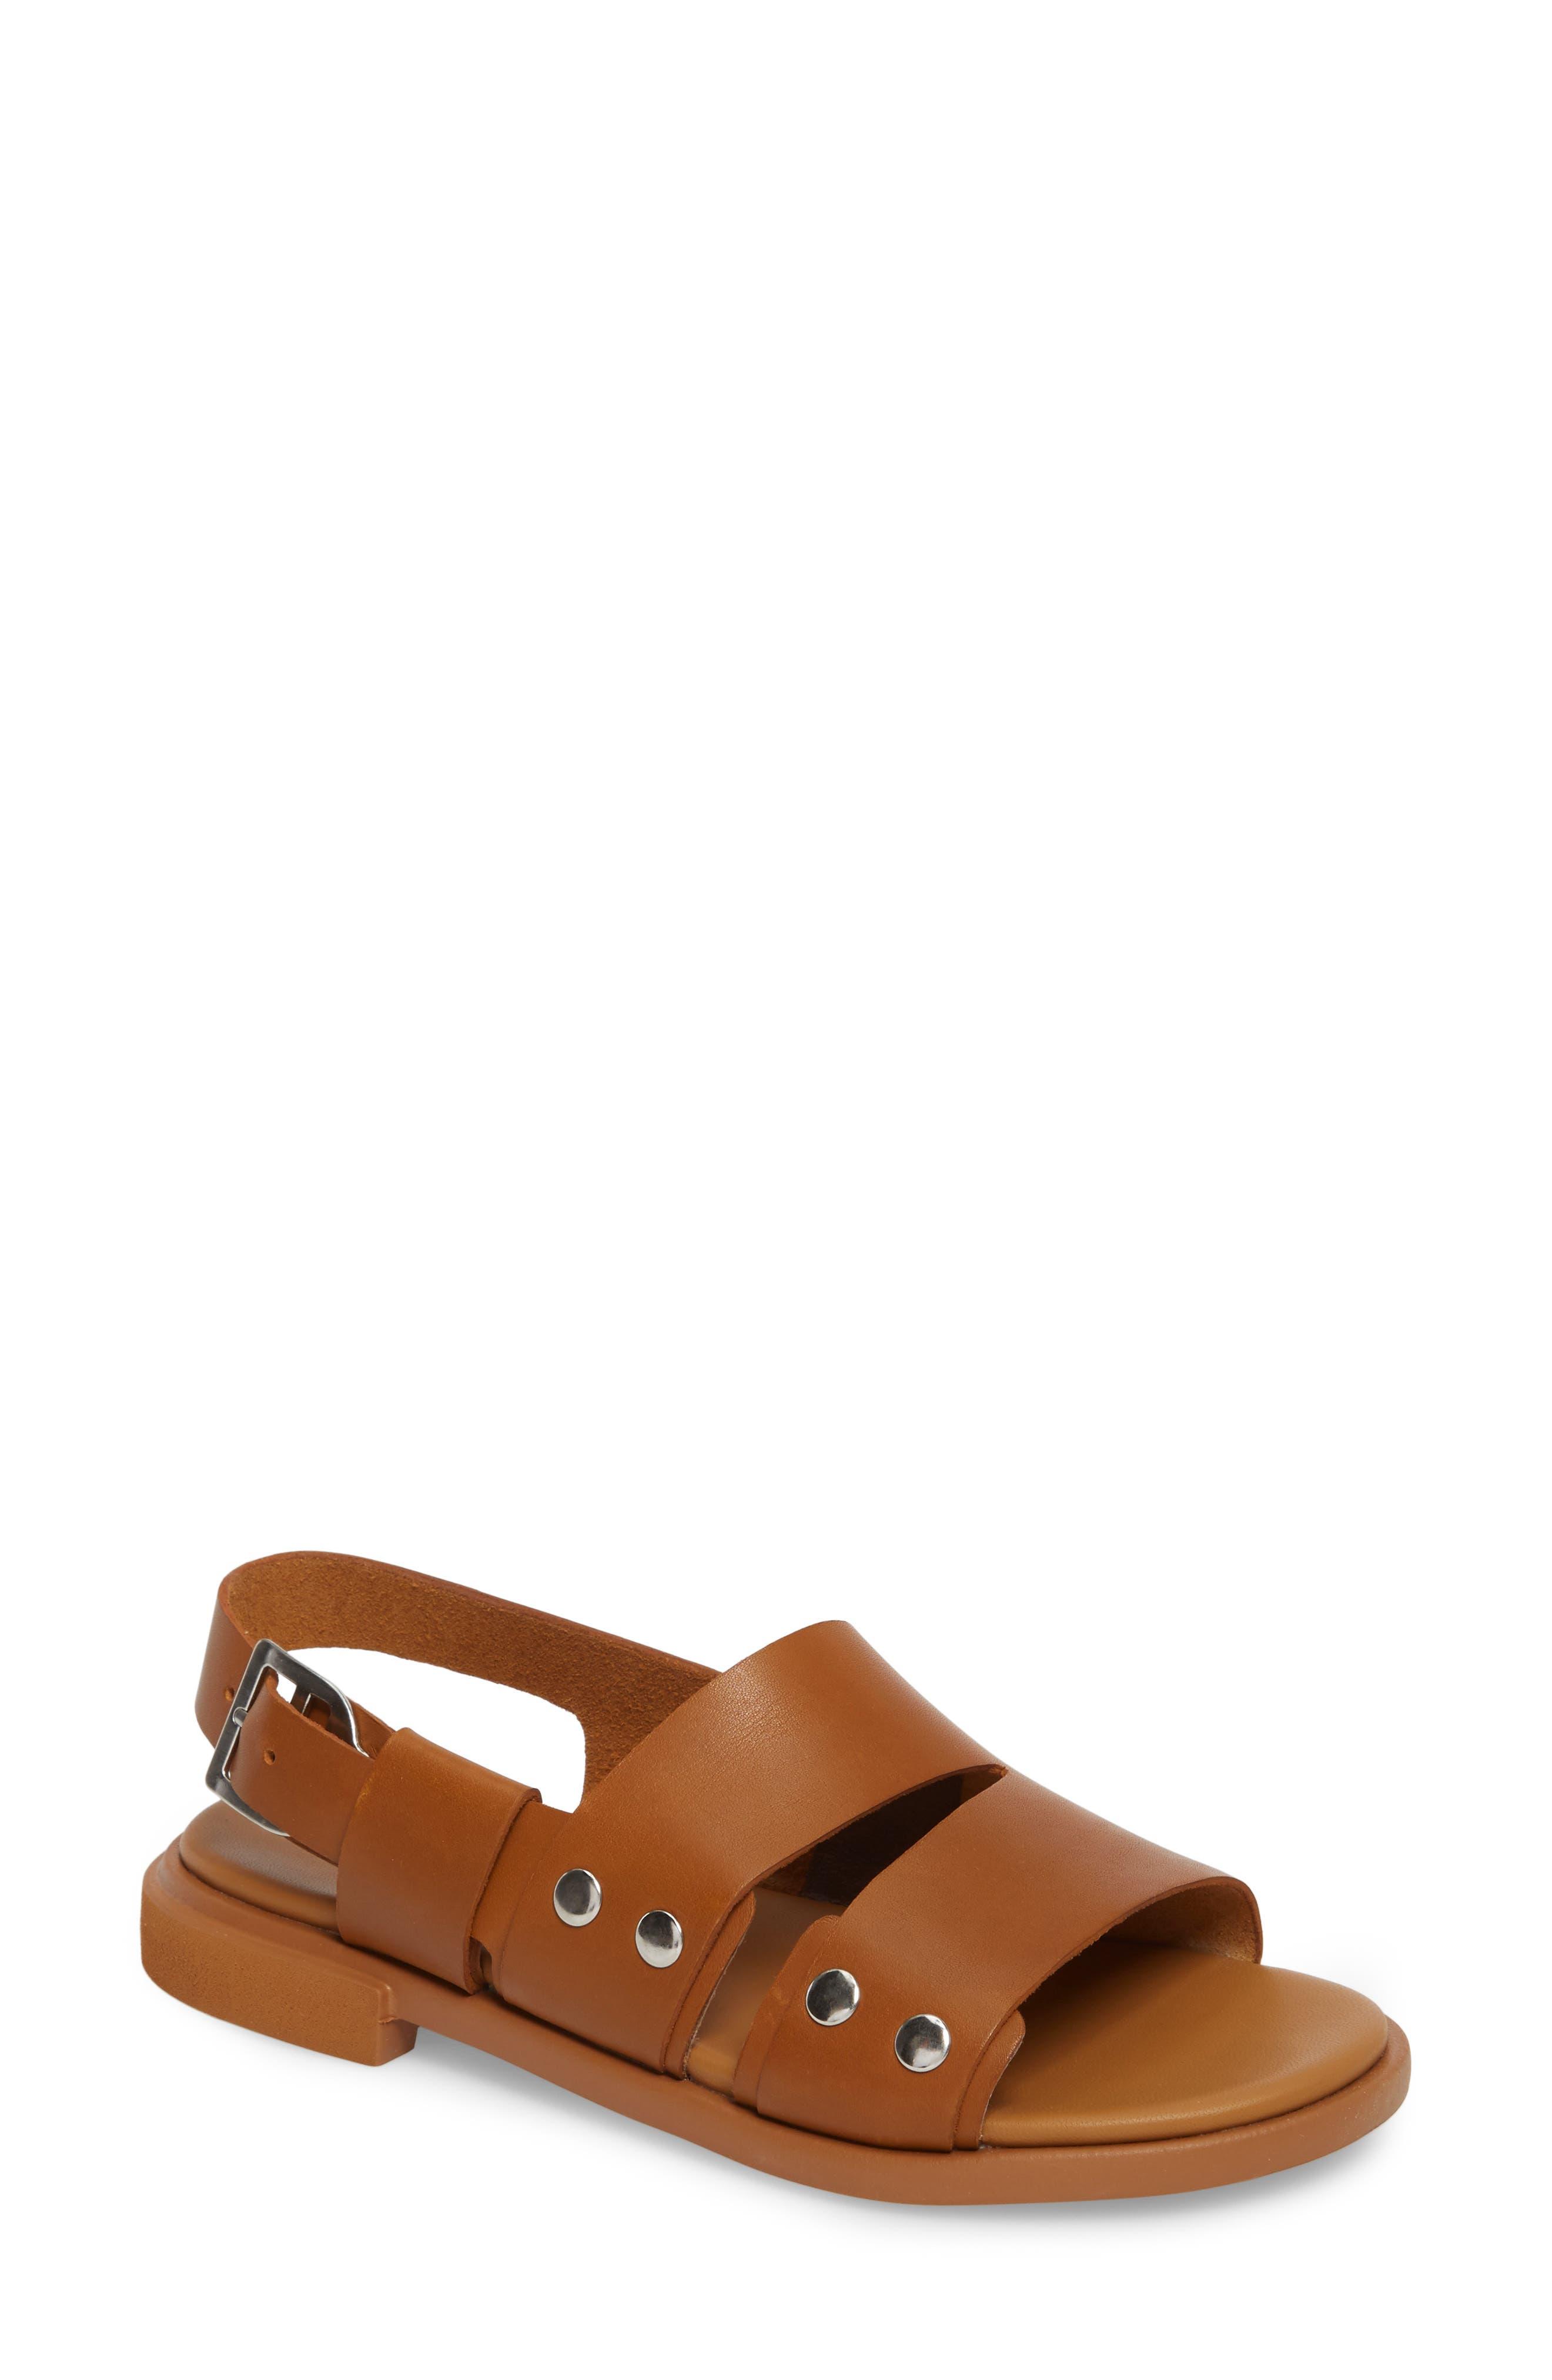 Edy Slingback Sandal,                         Main,                         color, RUST/ COPPER LEATHER